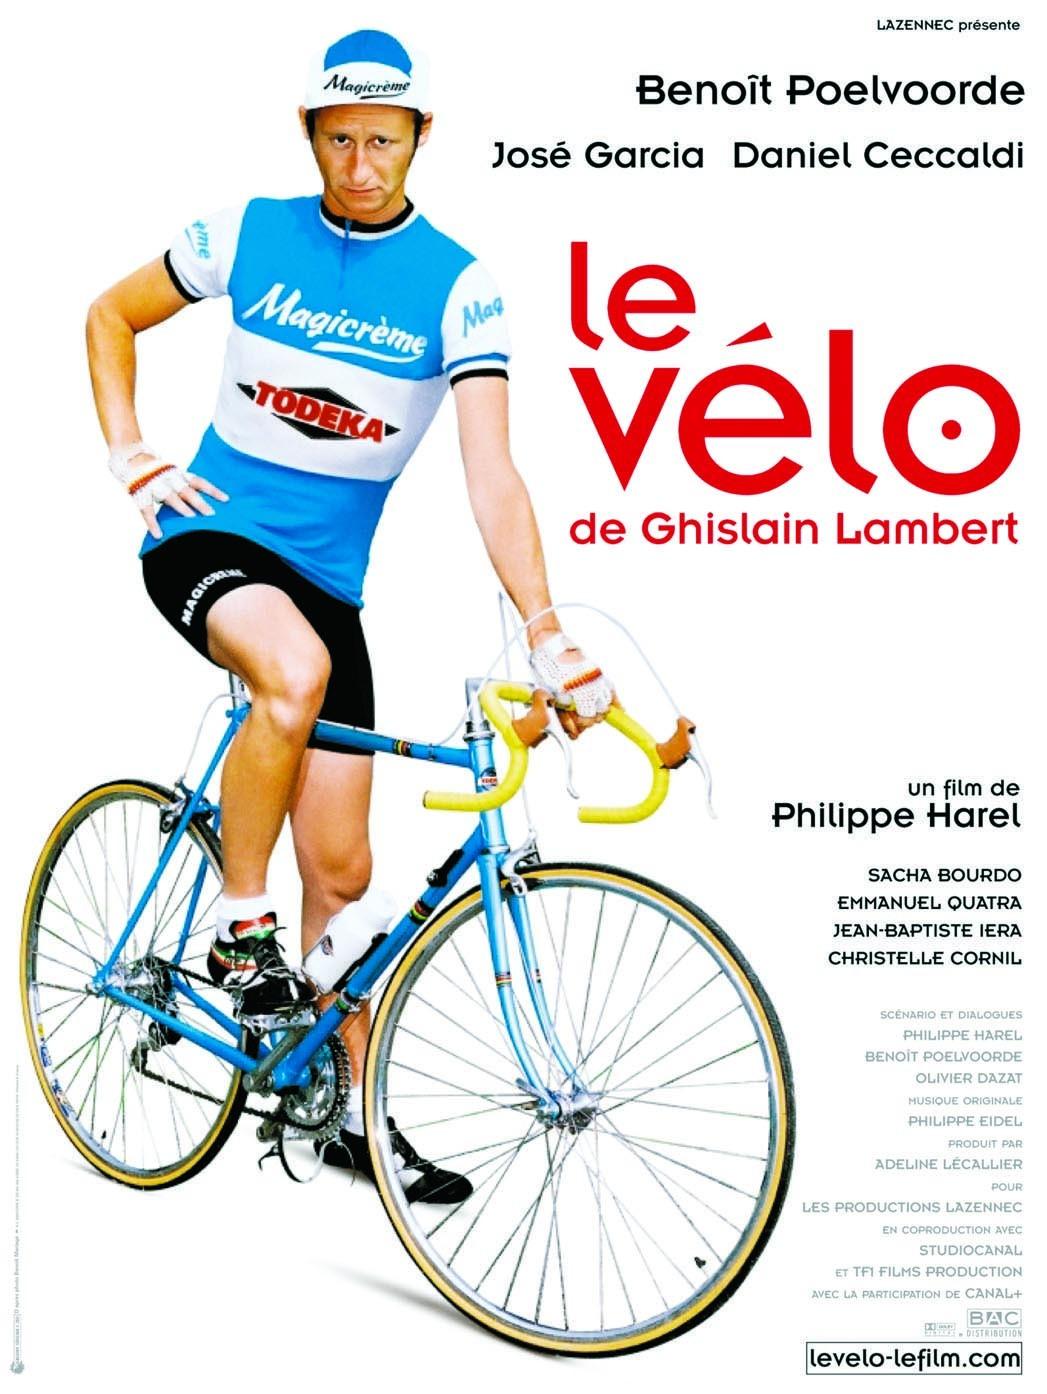 Ciclismo y Cine Le_velo_de_ghislain_lambert_xlg